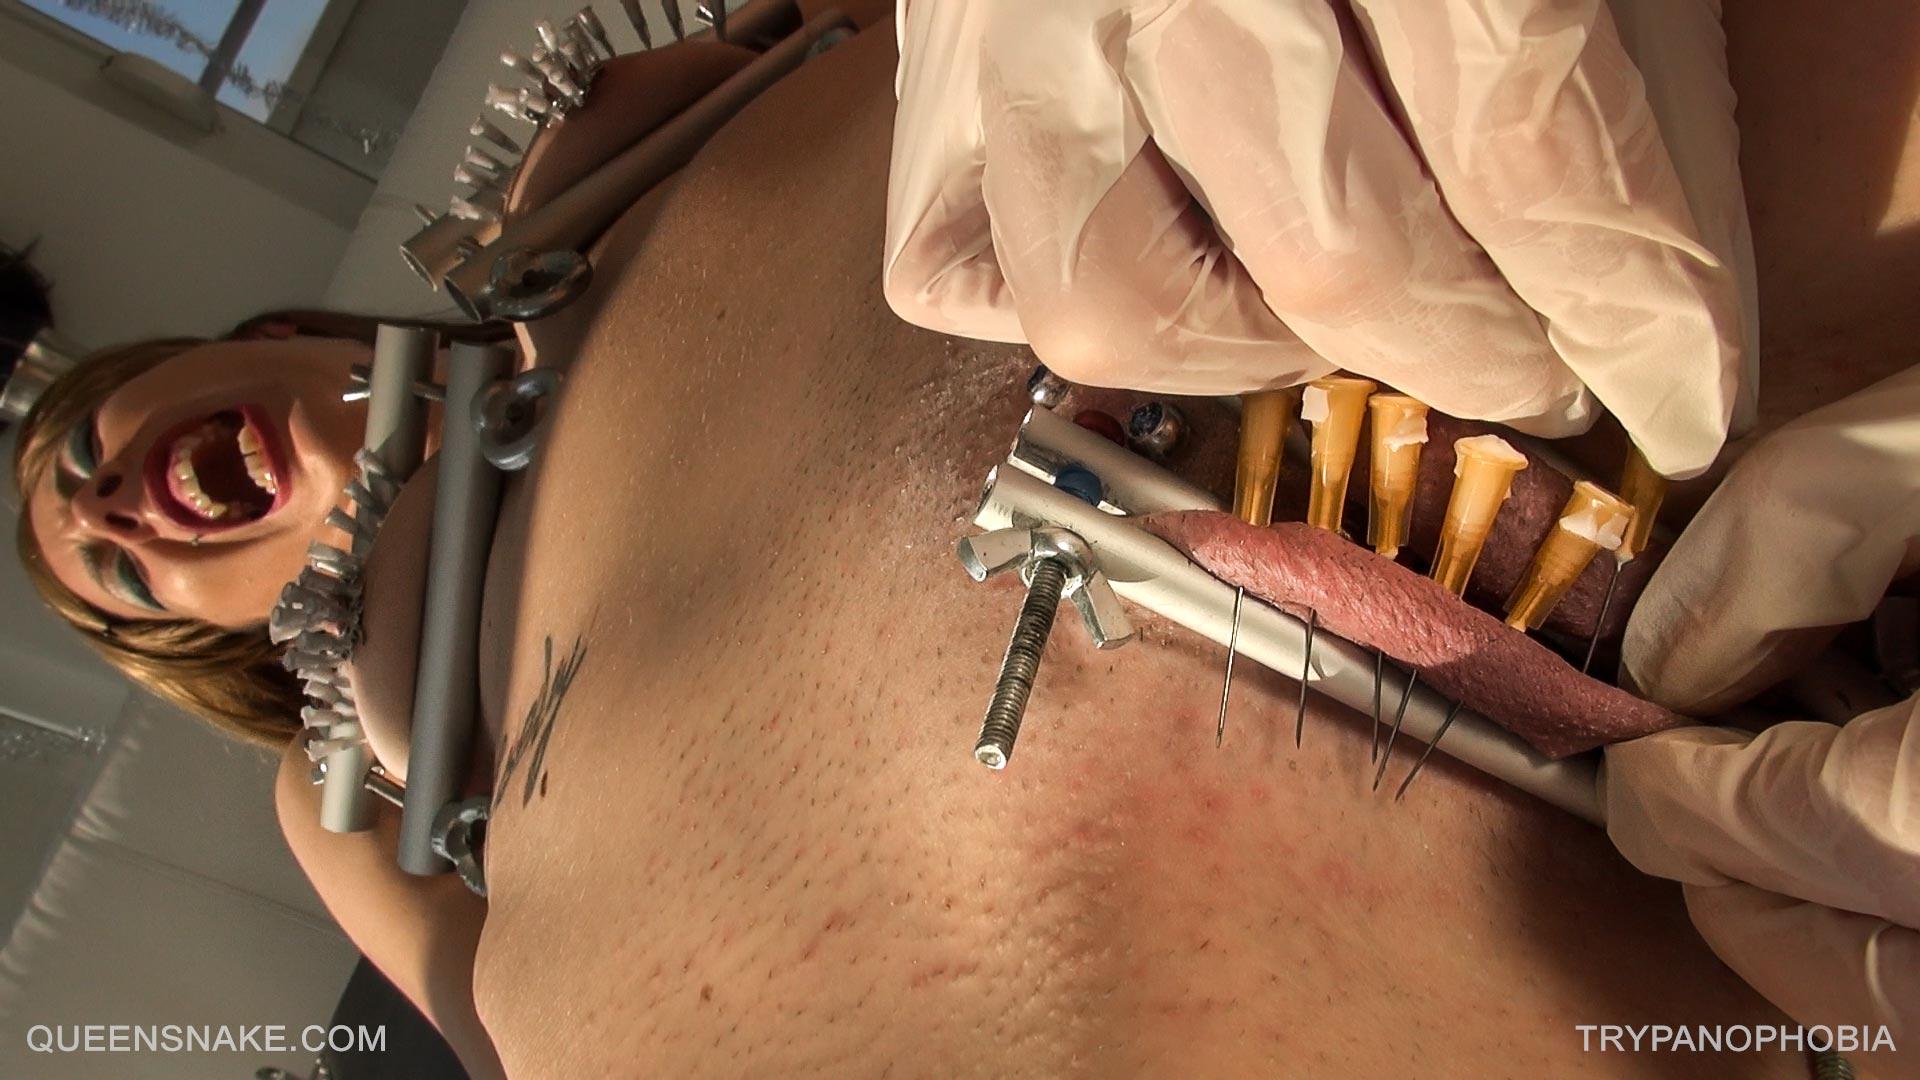 Favorite clit needles LOVE YOUR